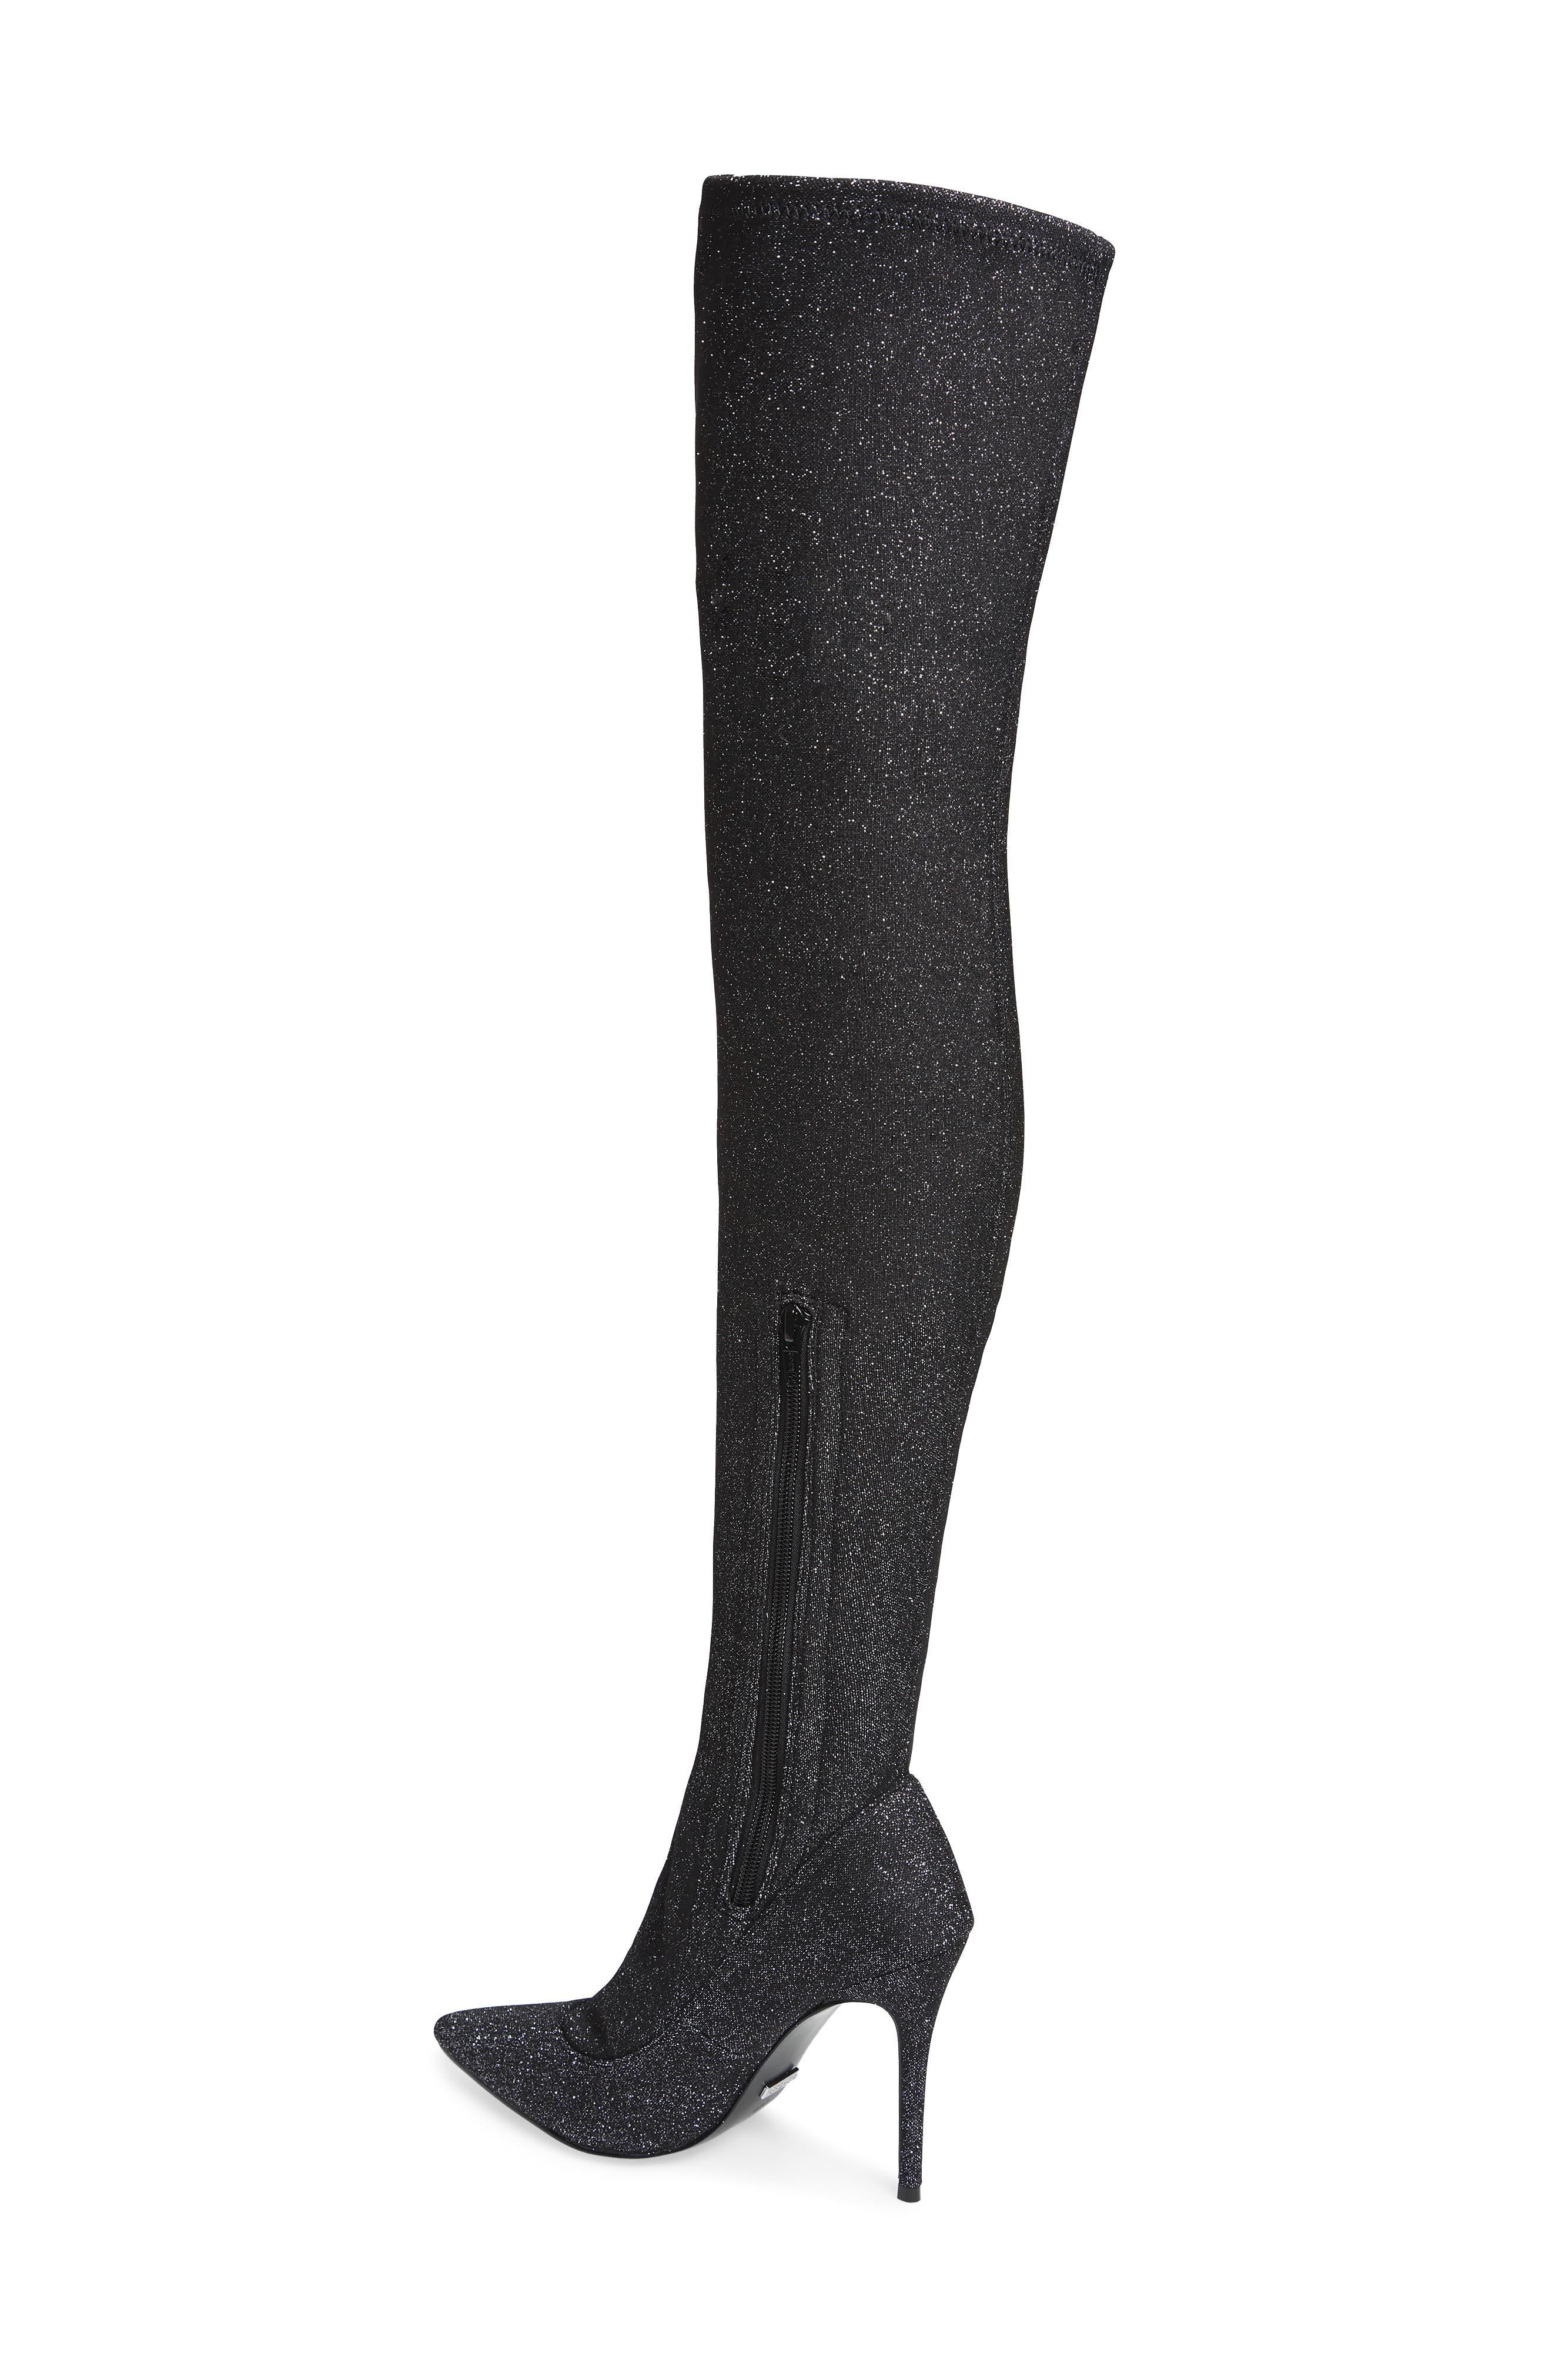 Alternate Image 2  - Topshop Bellini Stiletto Over the Knee Boot (Women)